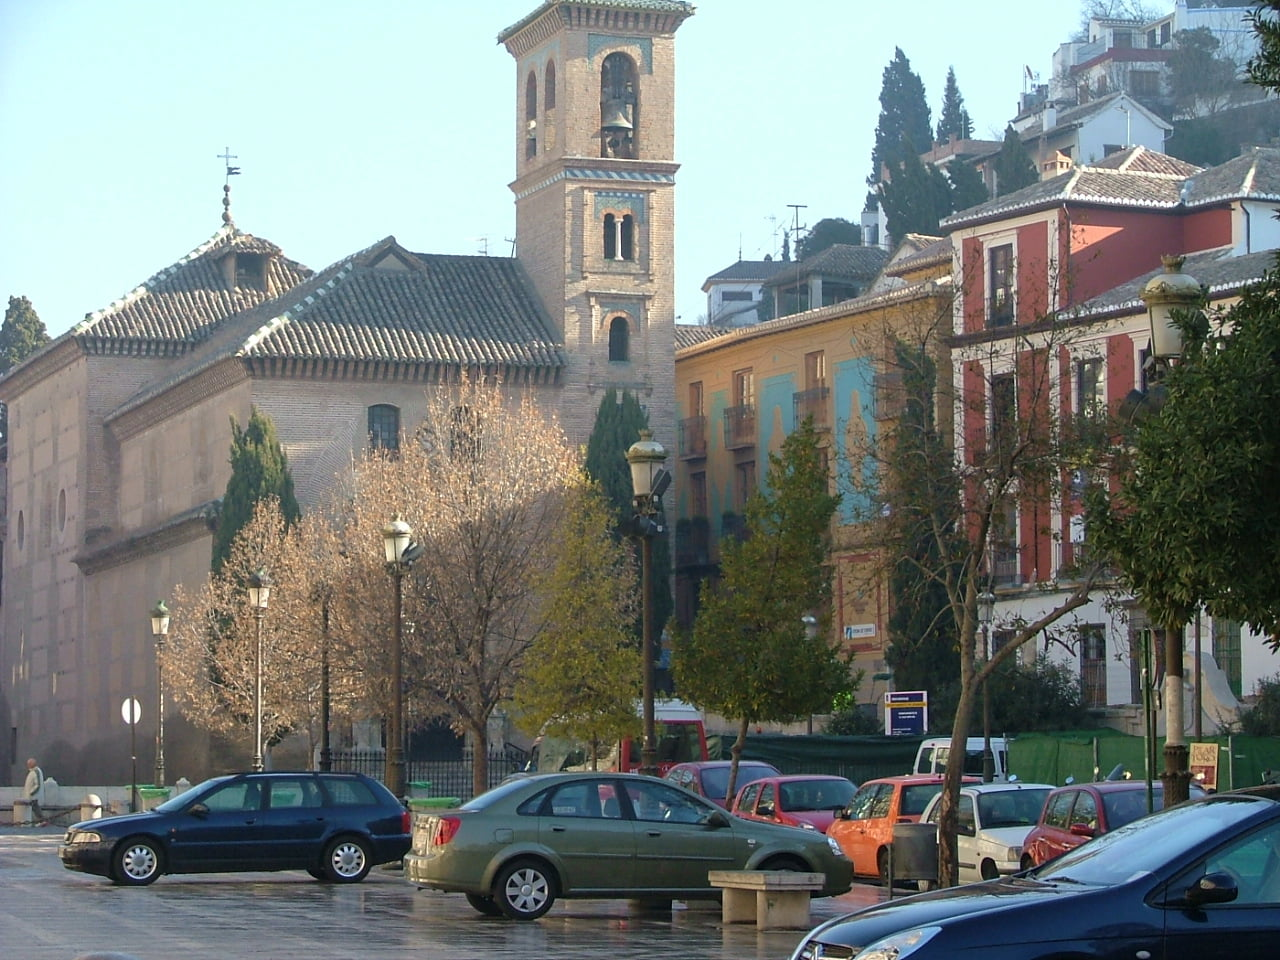 Plaza de Santa Ana de Granada